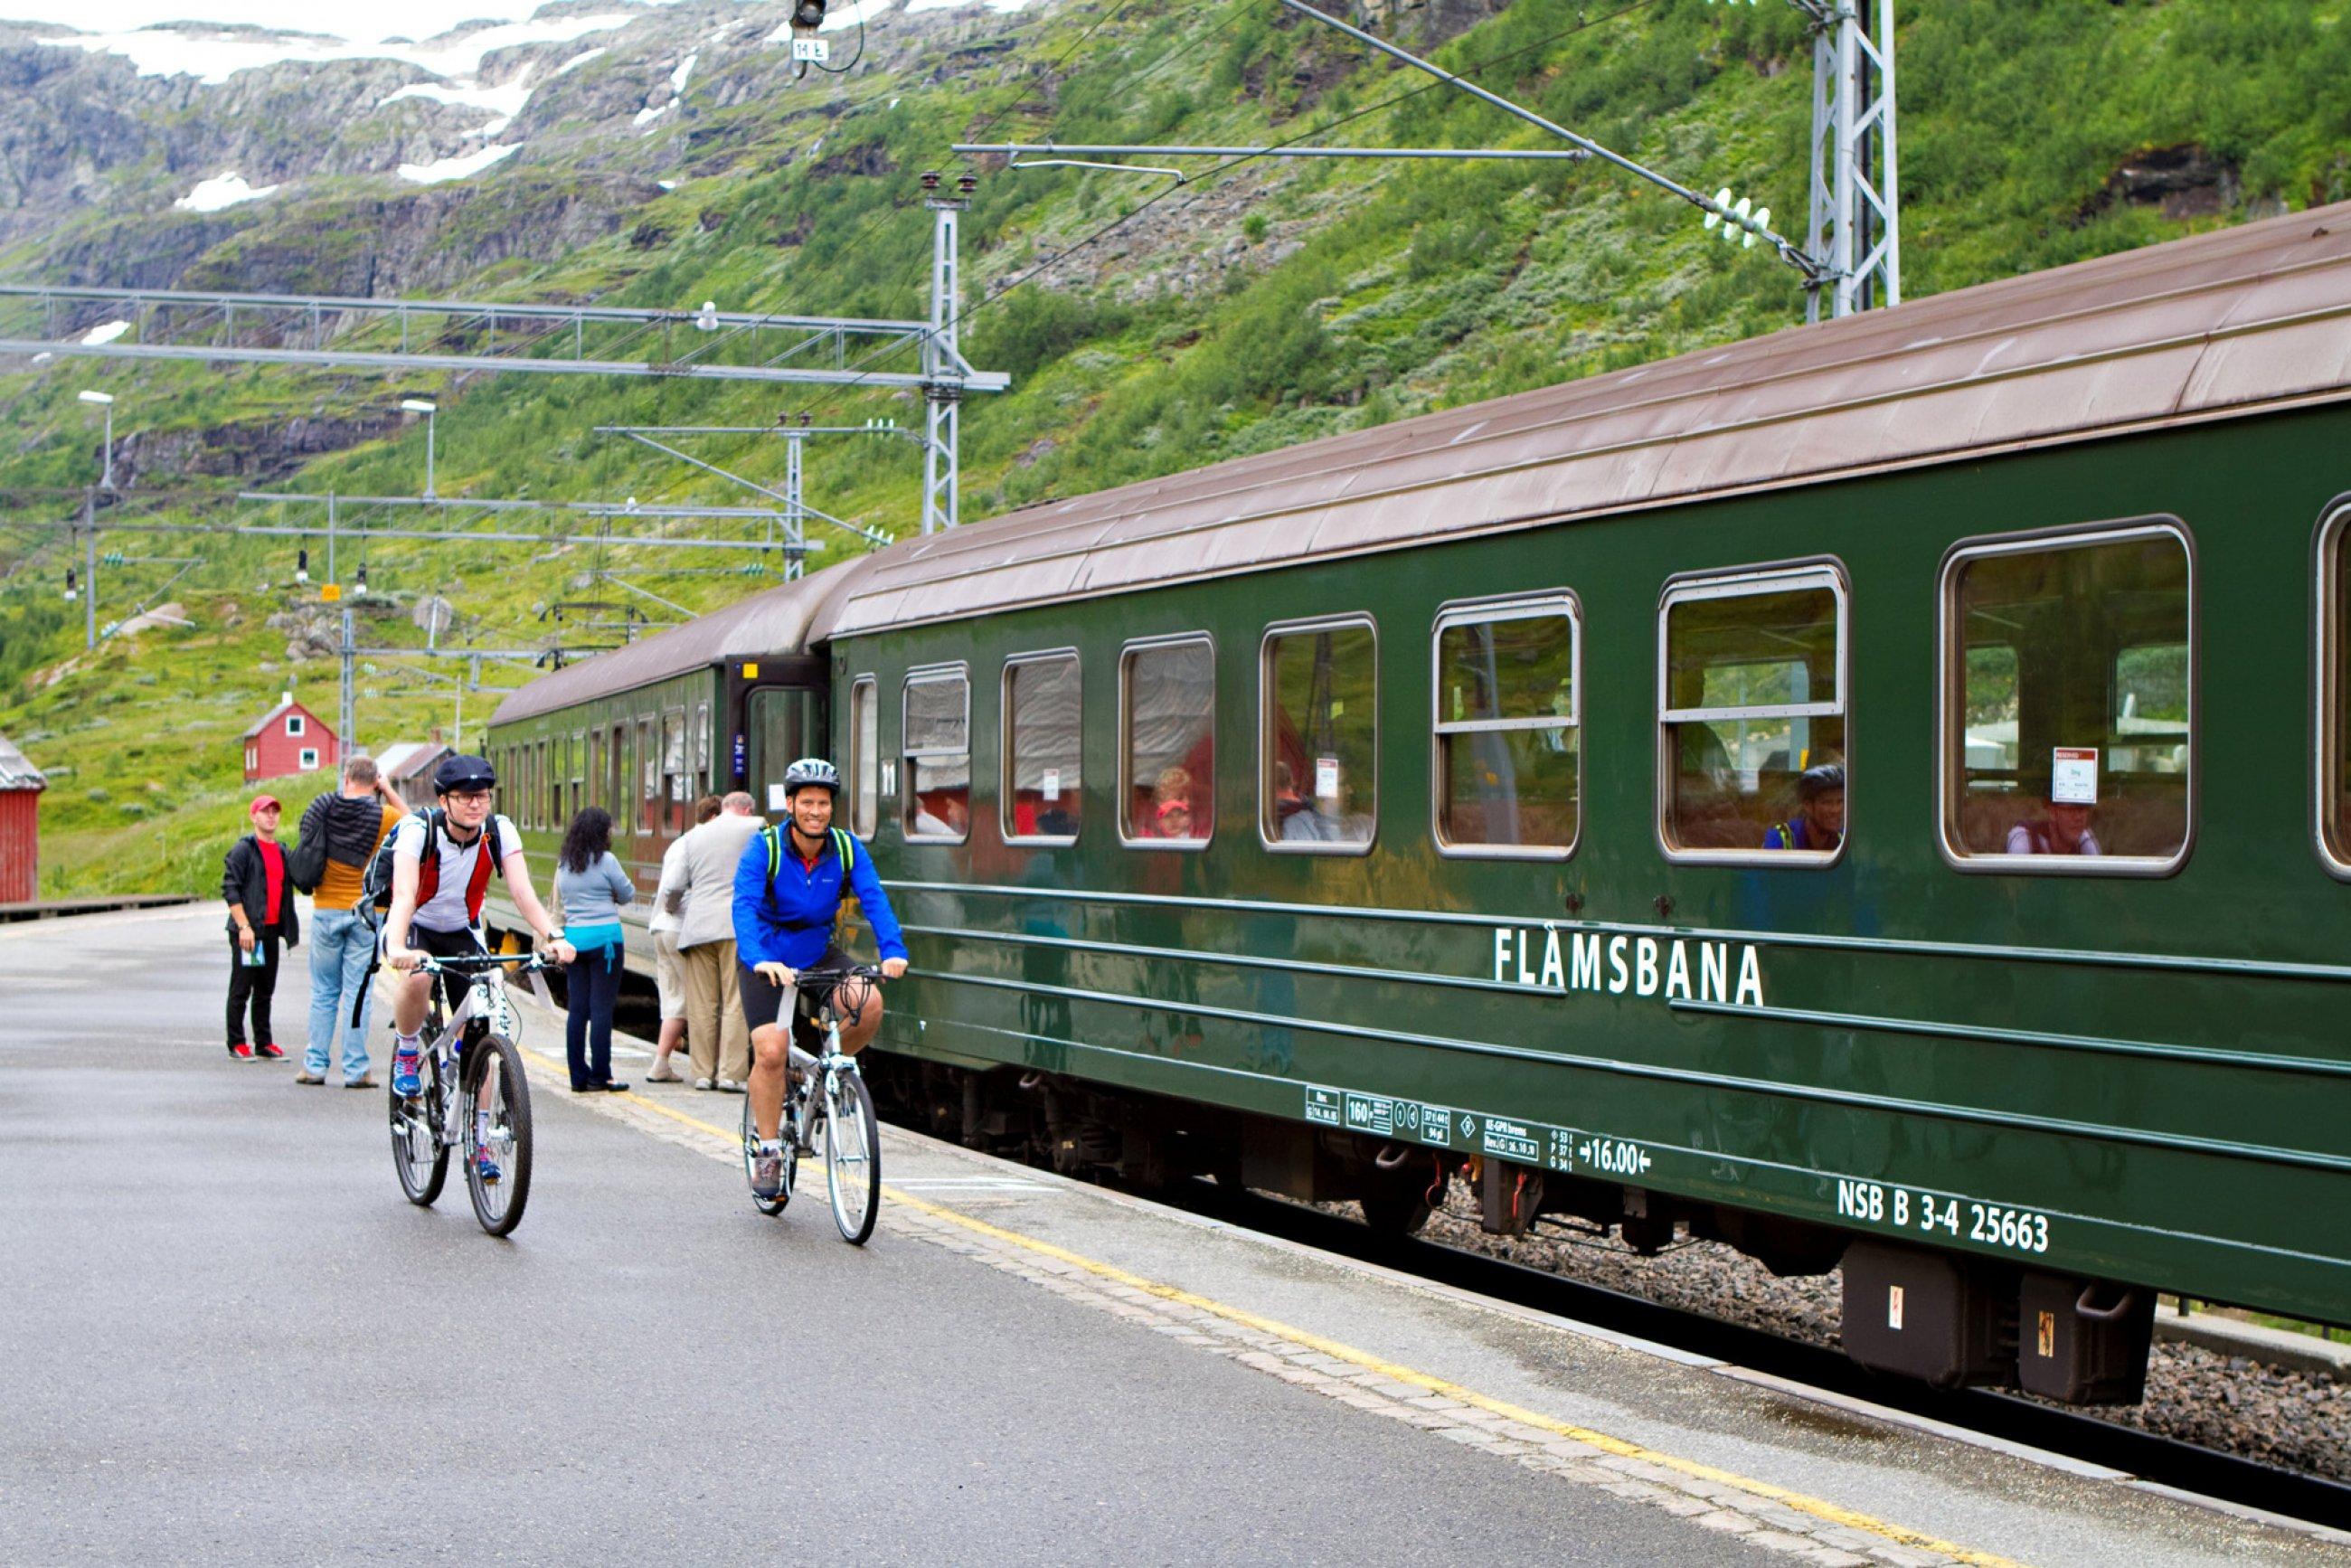 https://bubo.sk/uploads/galleries/7531/norsko-flam-vlak.jpg